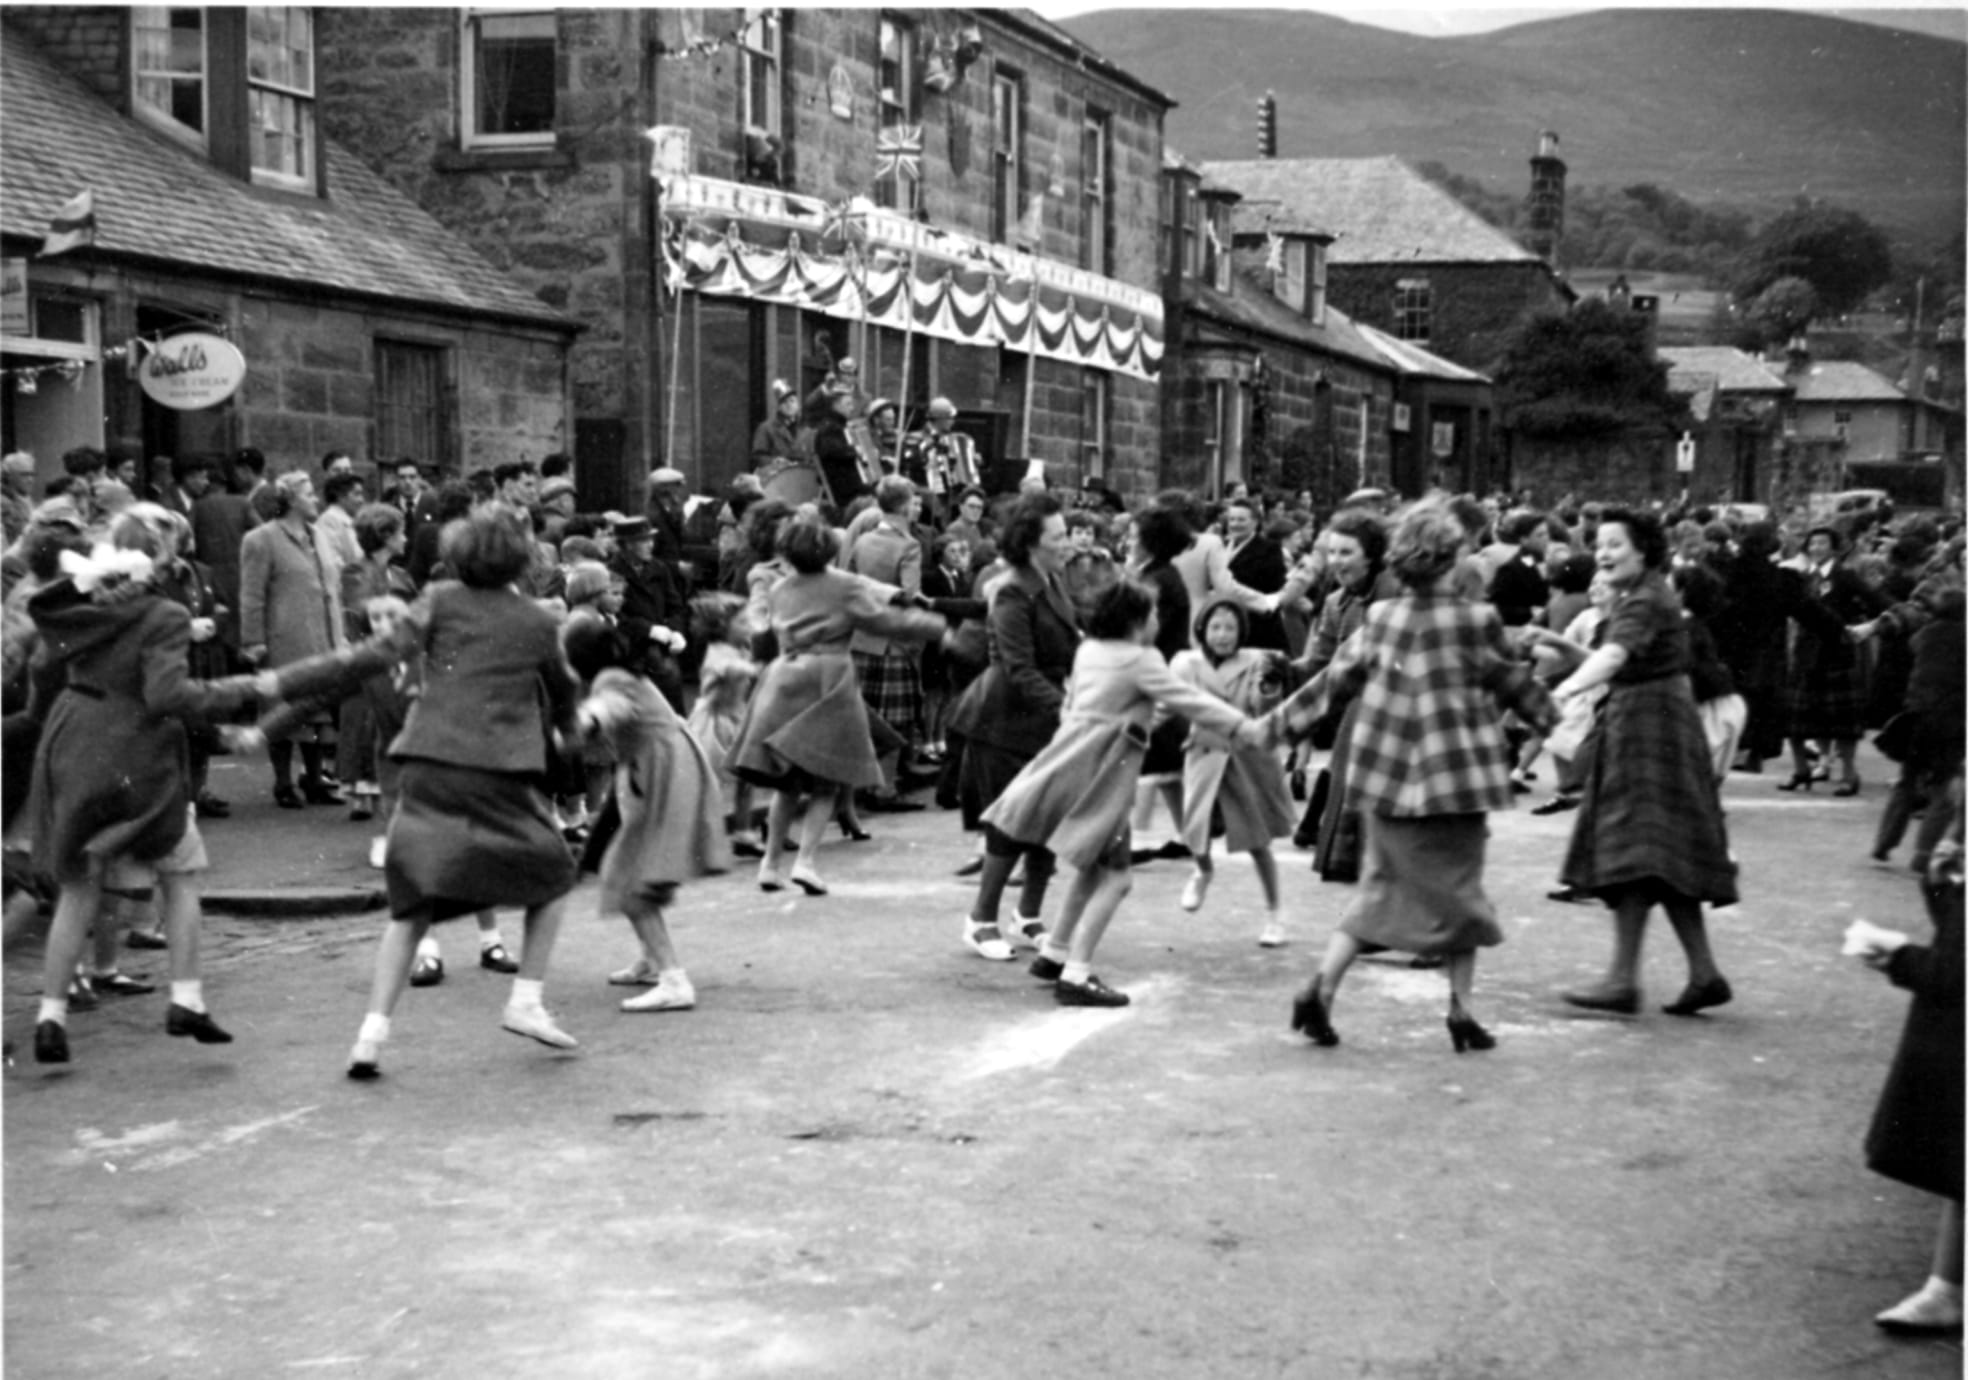 Dancing in Burnside - Coronation 1953